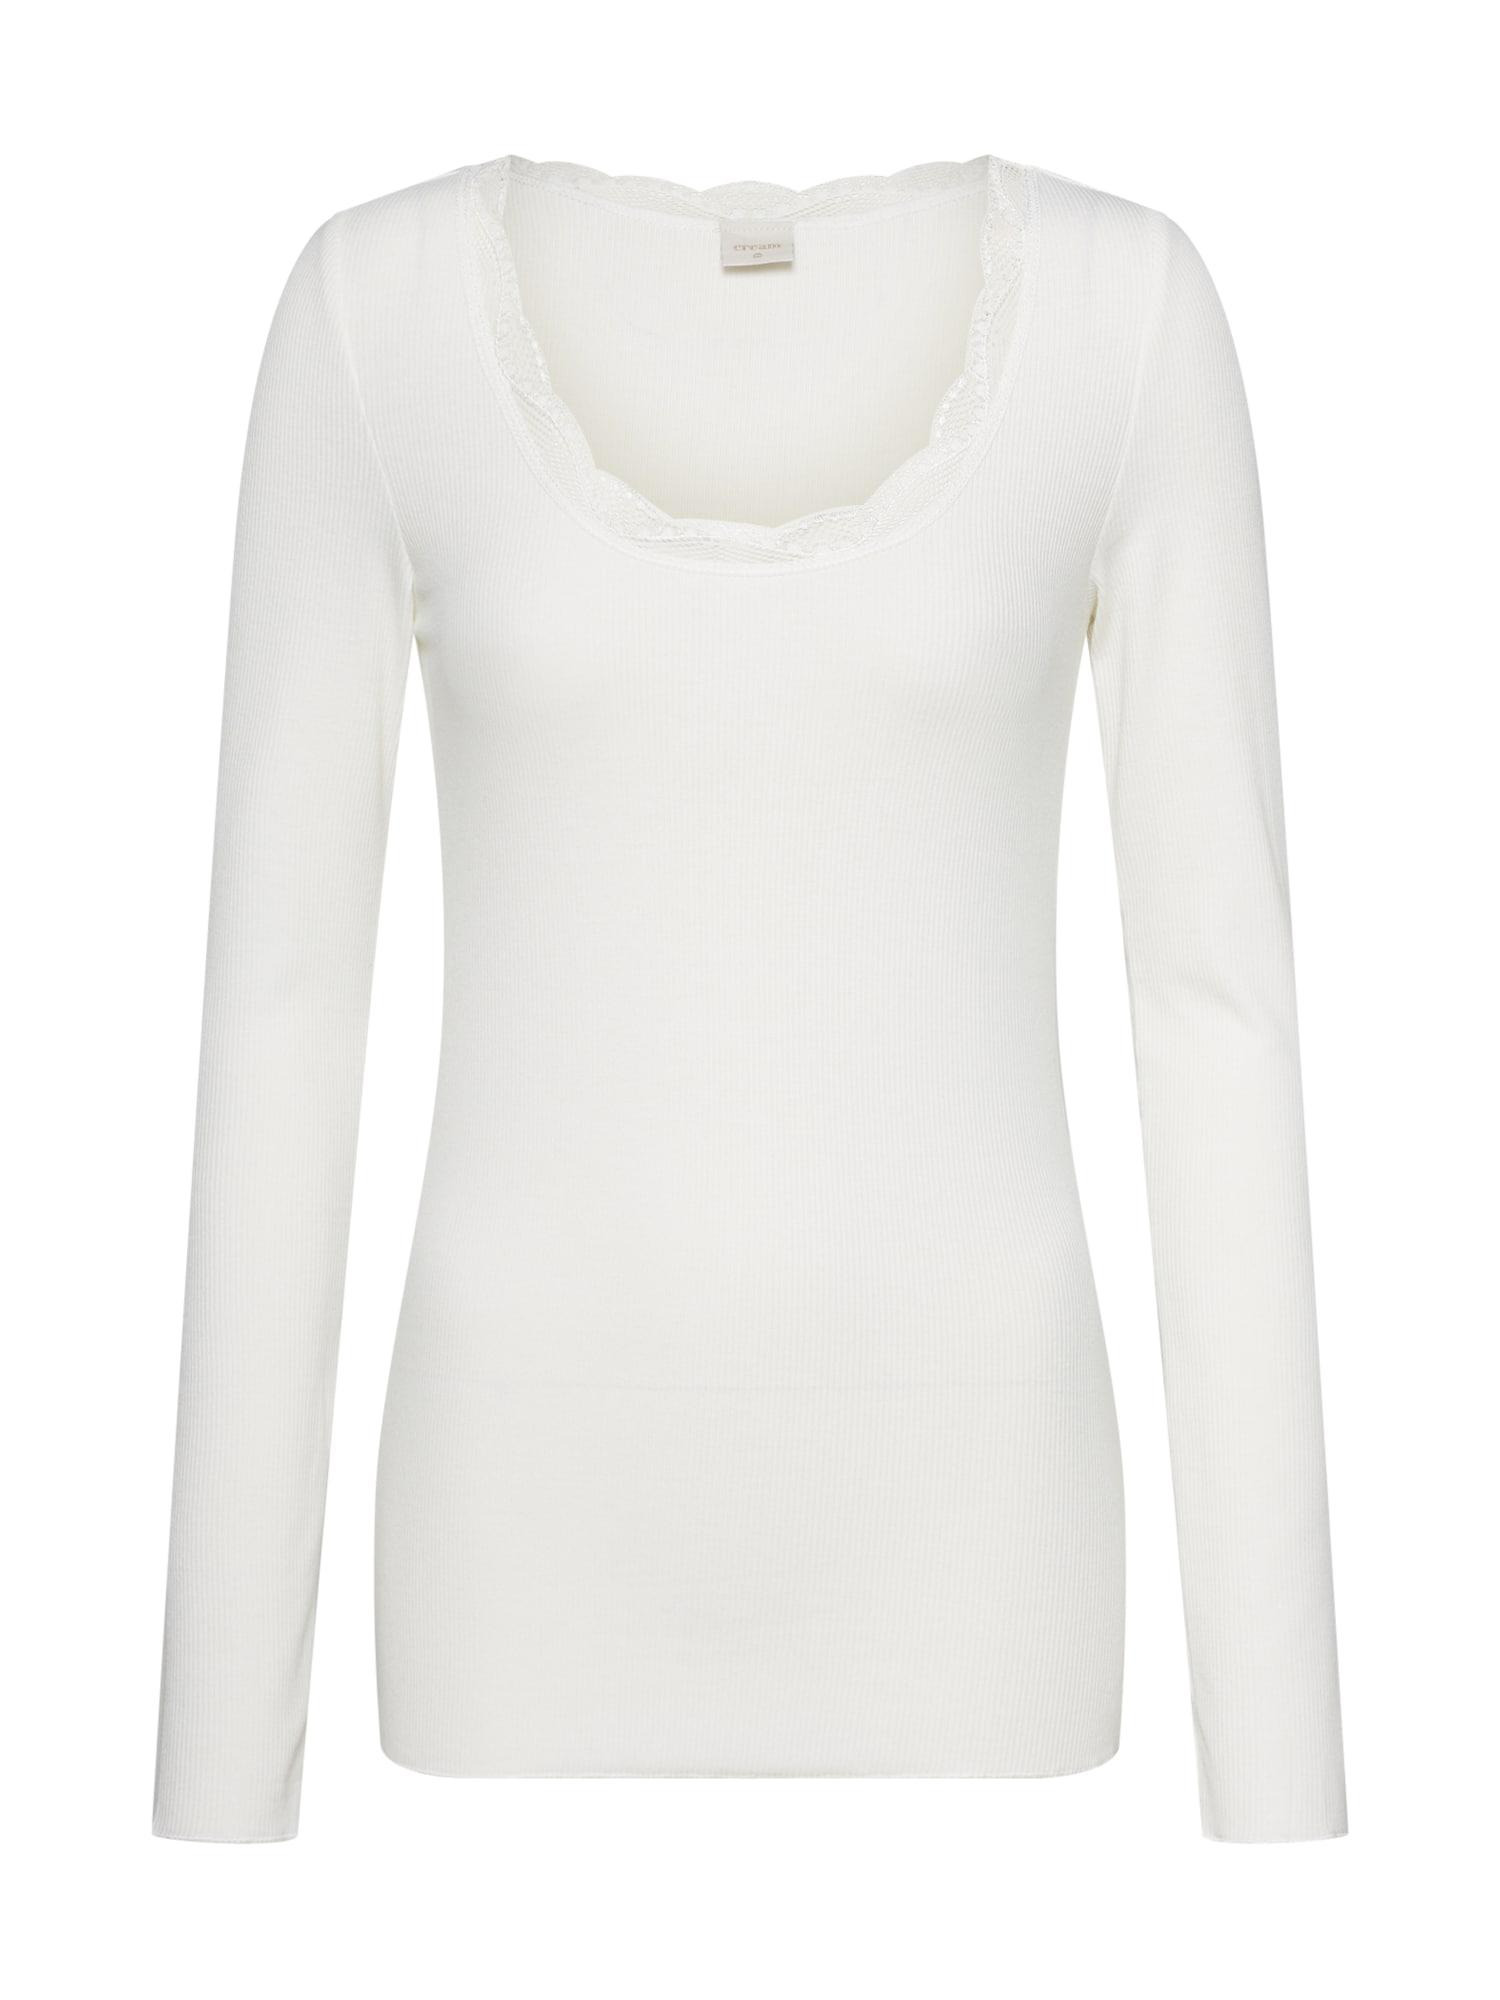 Tričko Vanessa béžová Cream